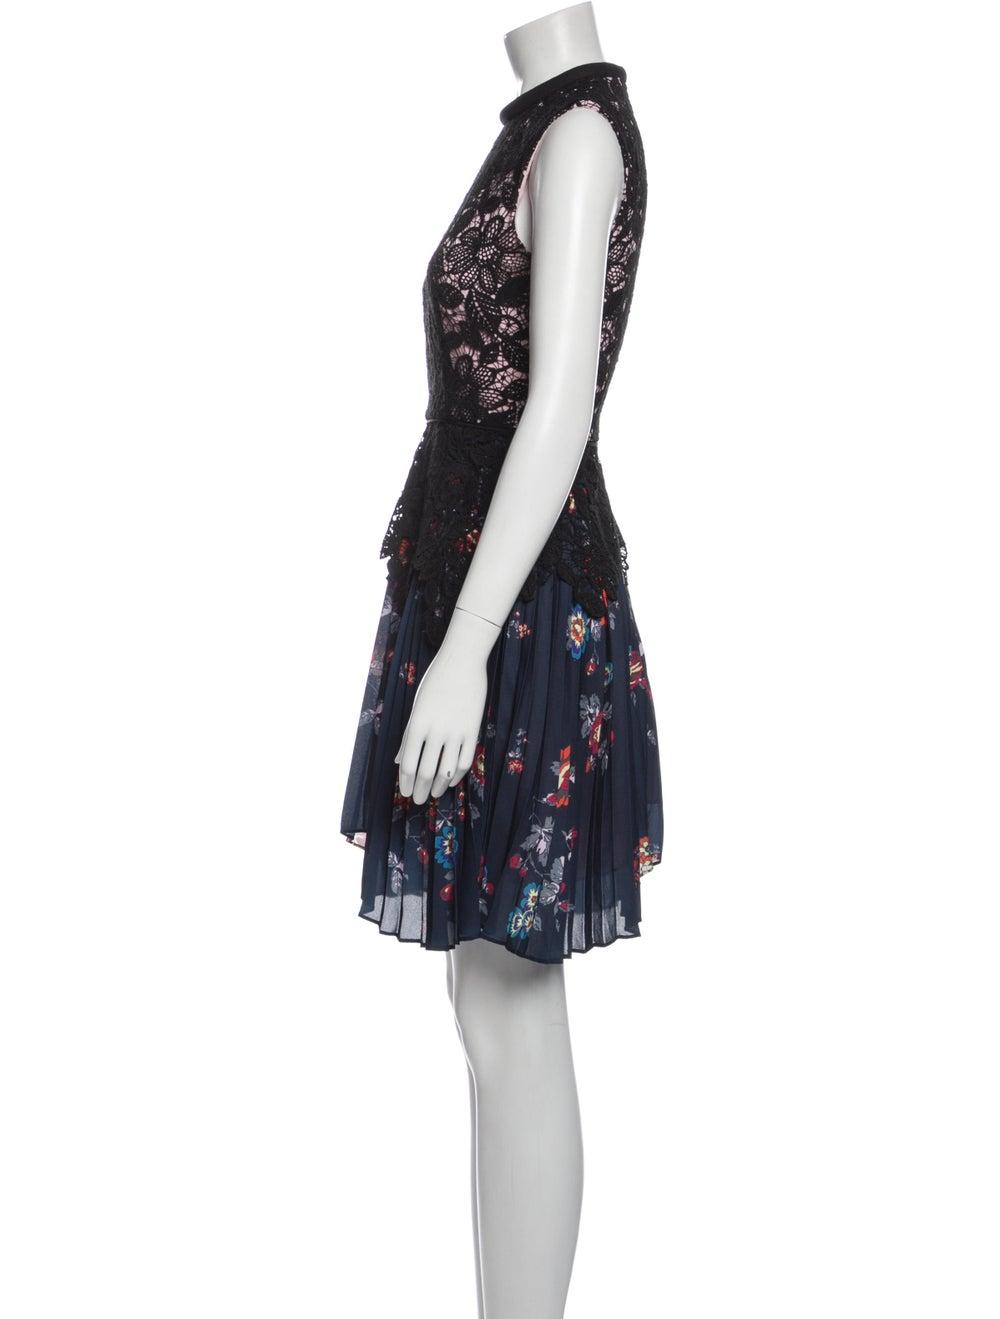 Self-Portrait Lace Pattern Knee-Length Dress Black - image 2